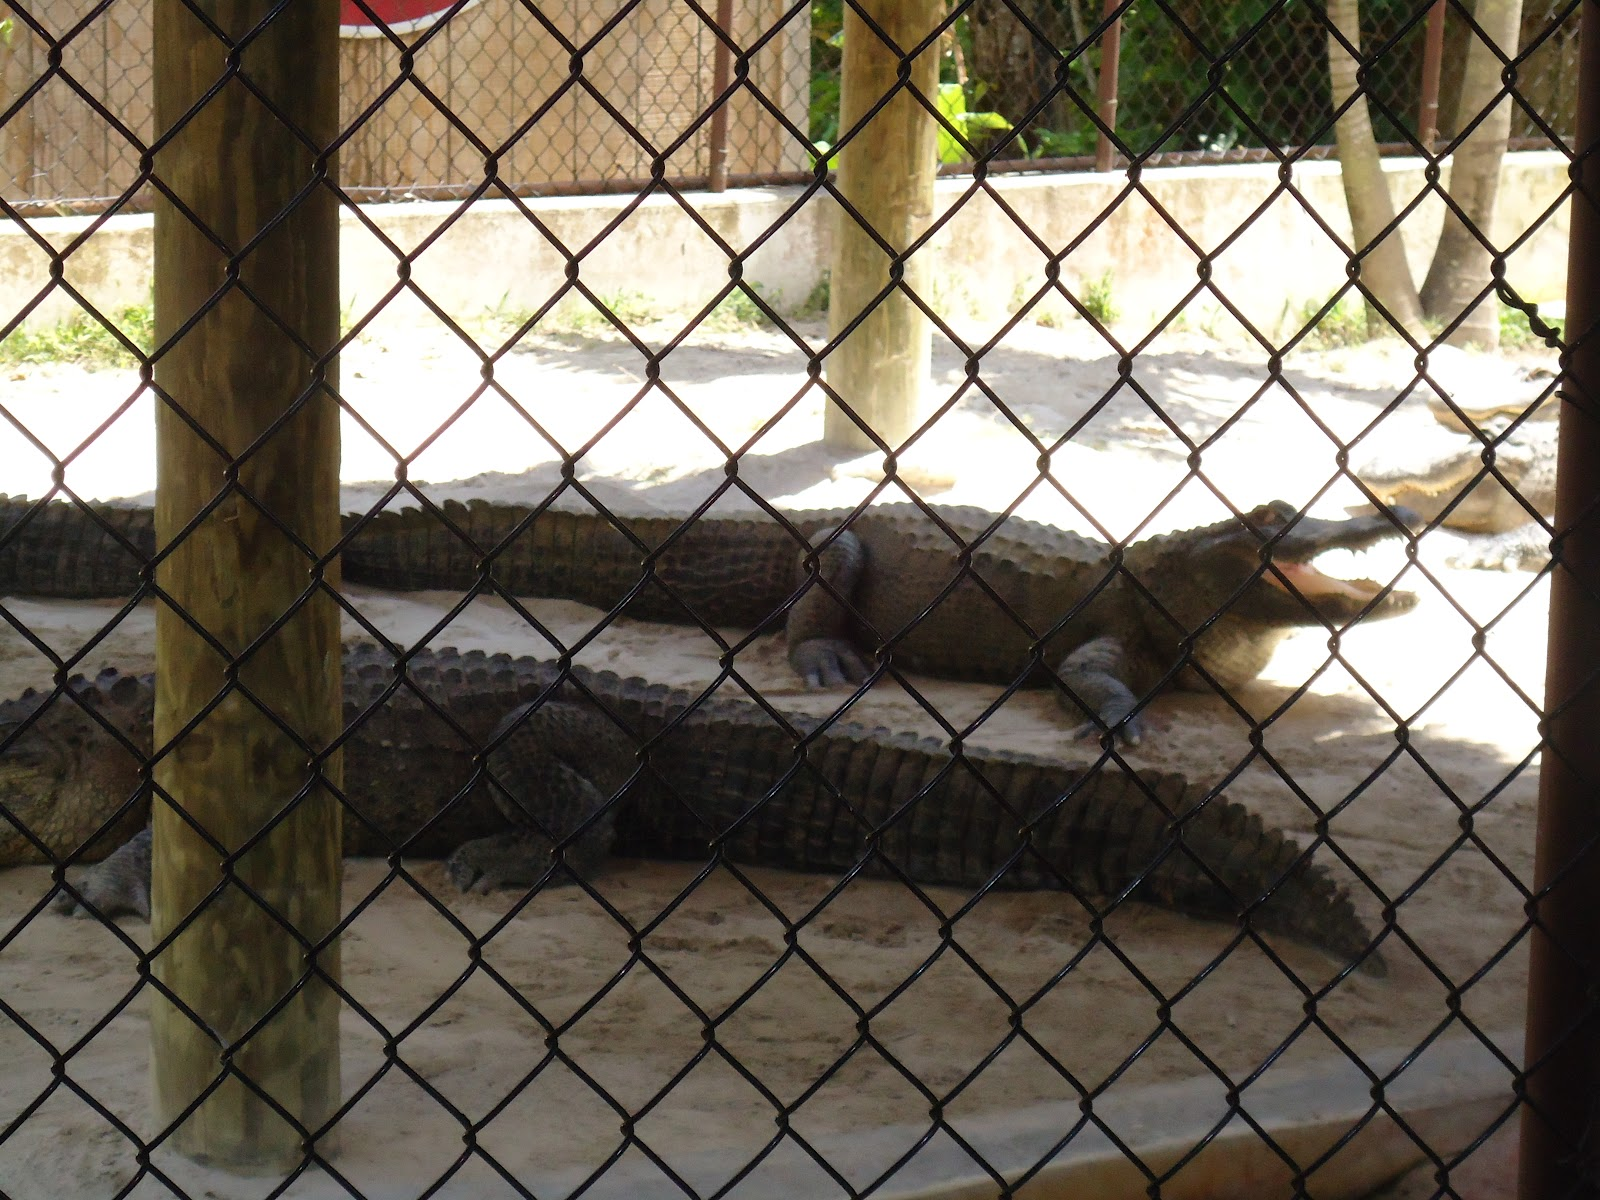 Smooth & Savvy Travels: The Everglades Safari Park